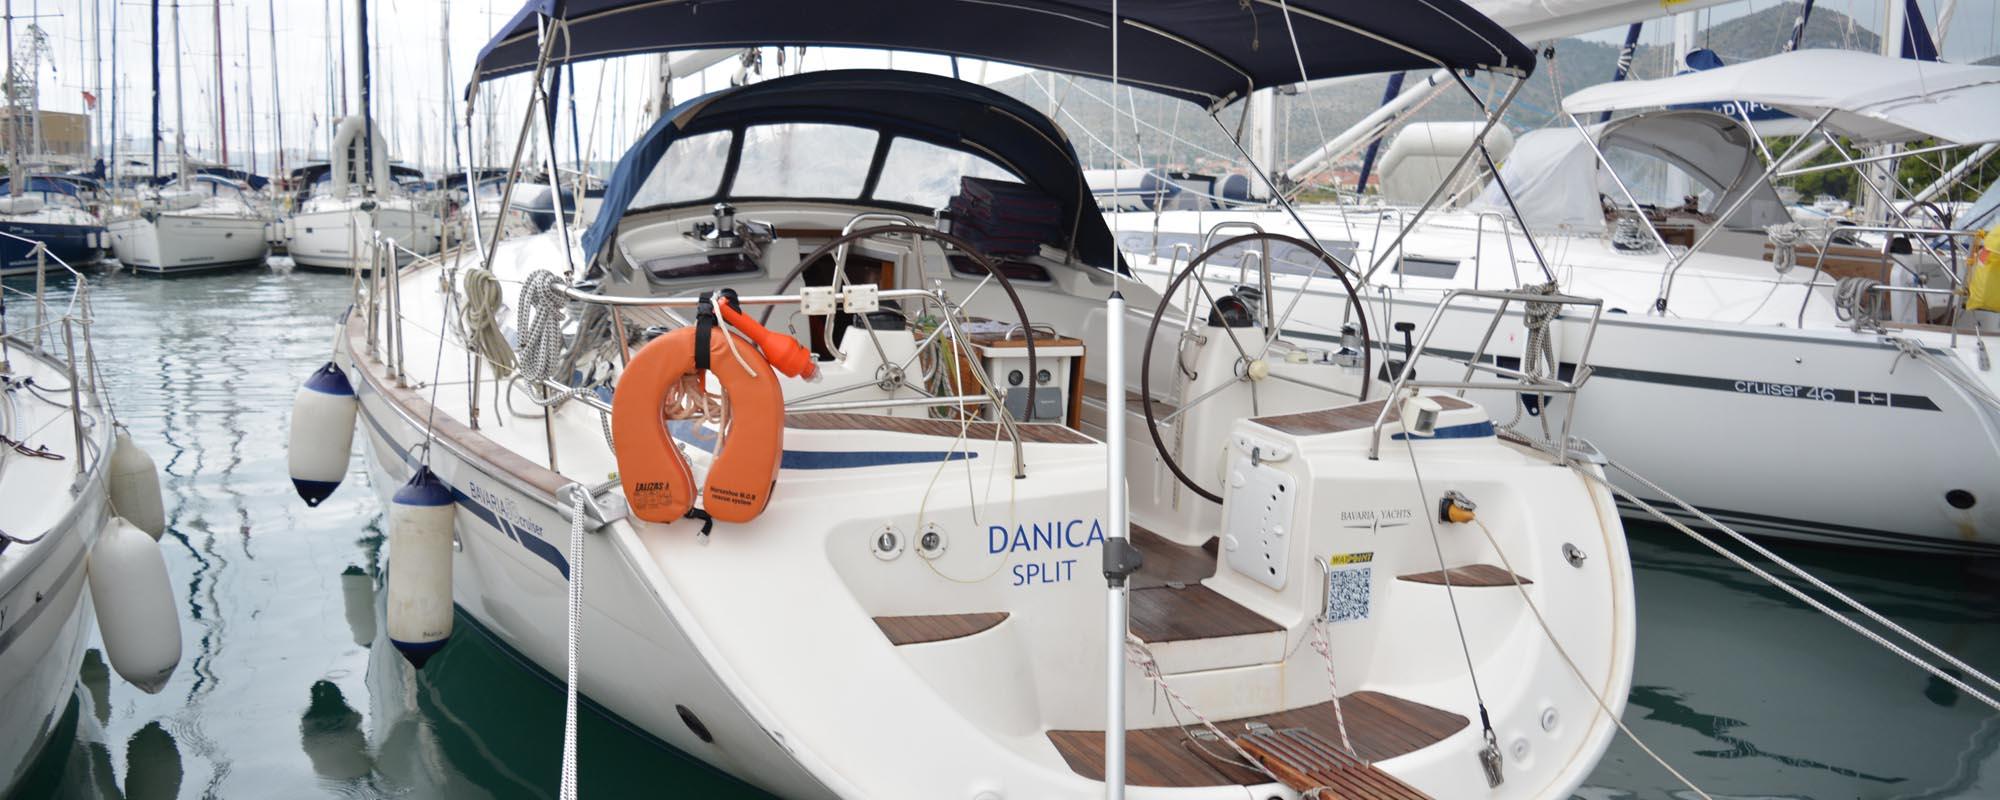 "Bavaria 50 Cruiser ""Danica"""